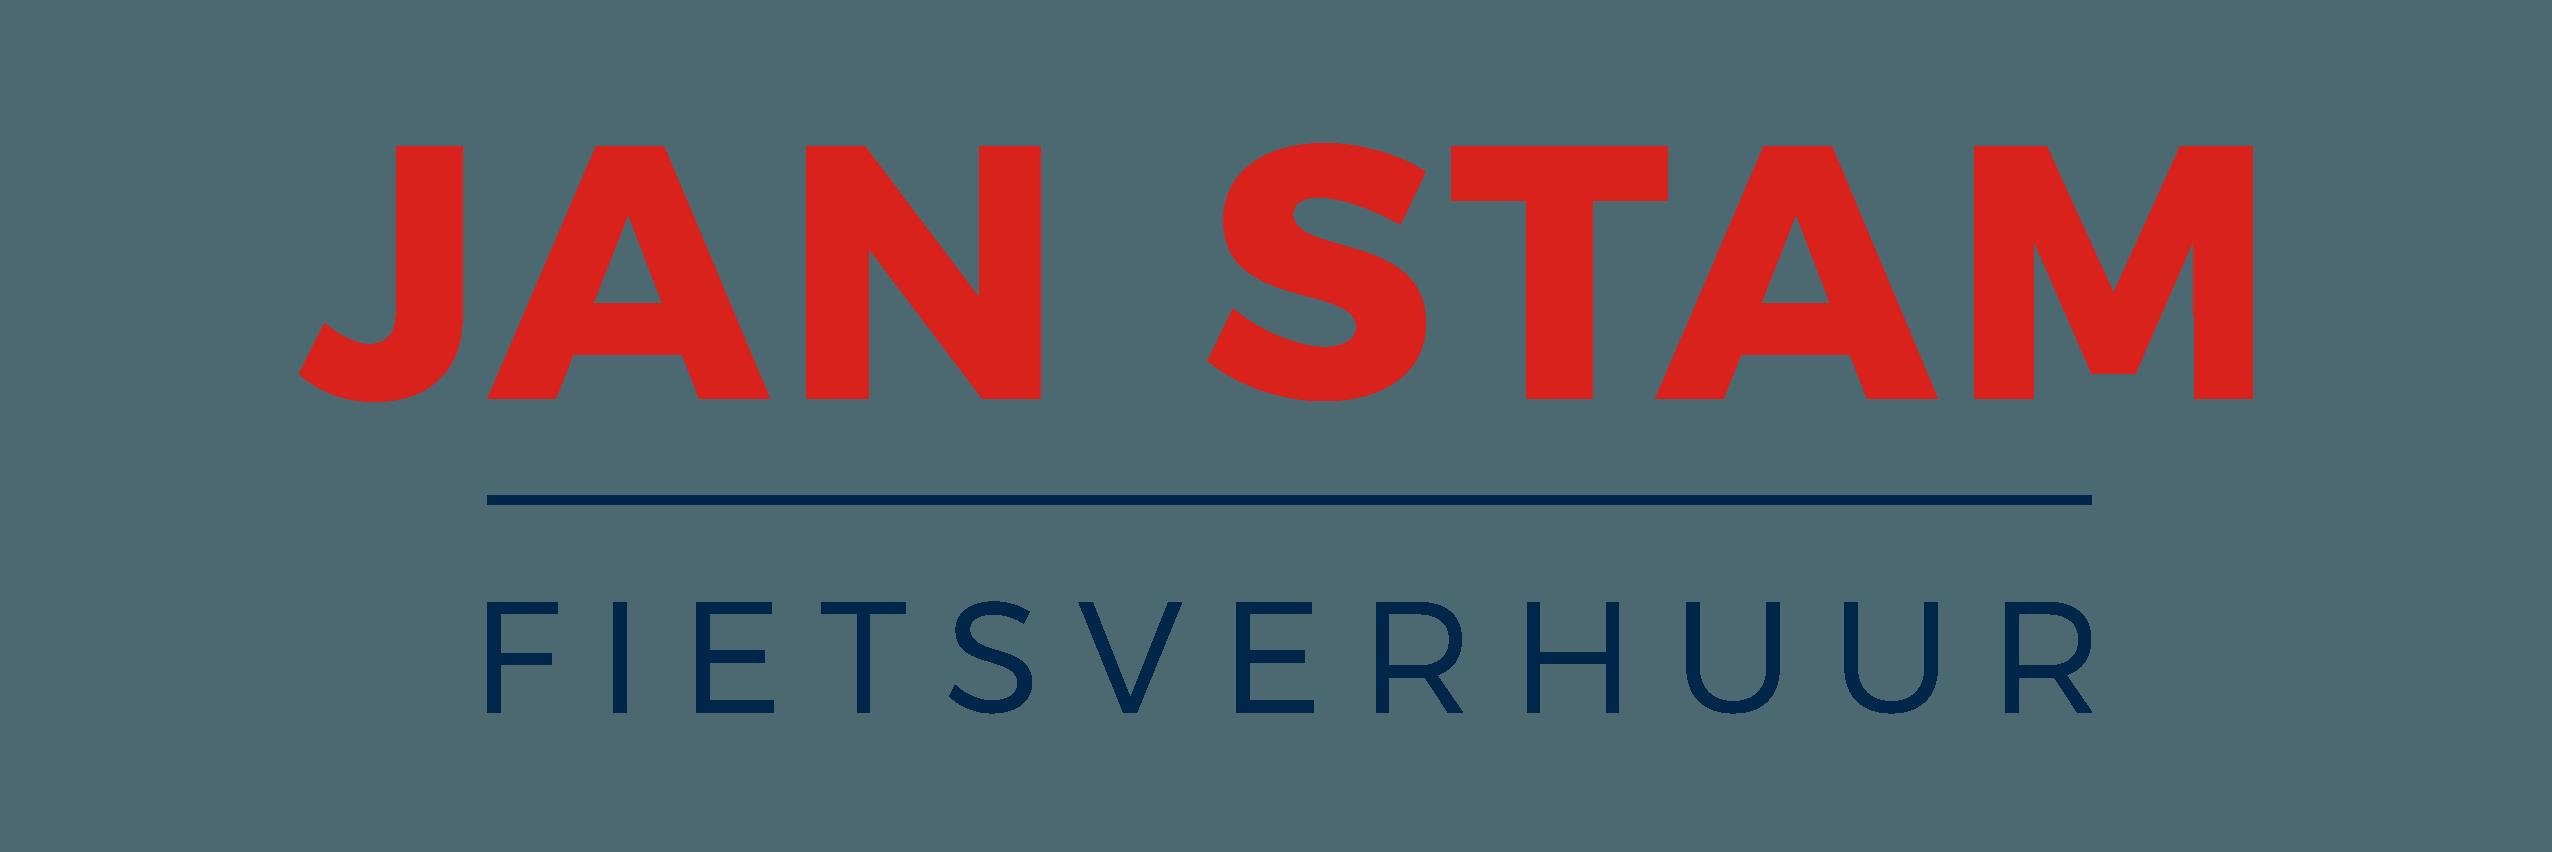 Jan Stam Fietsverhuur